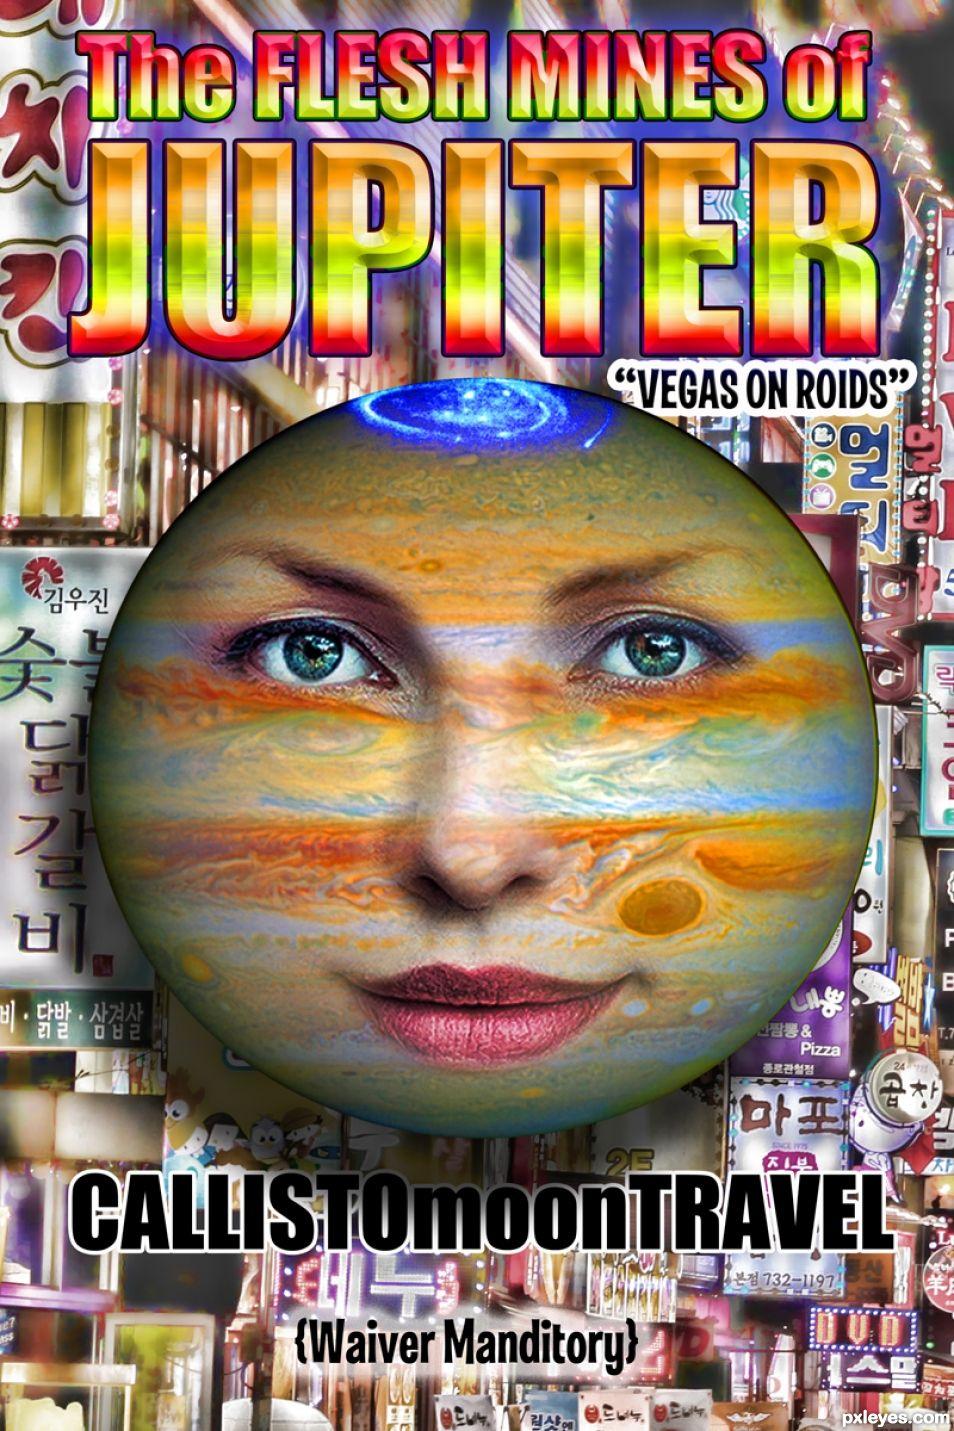 The Jupiter Booking